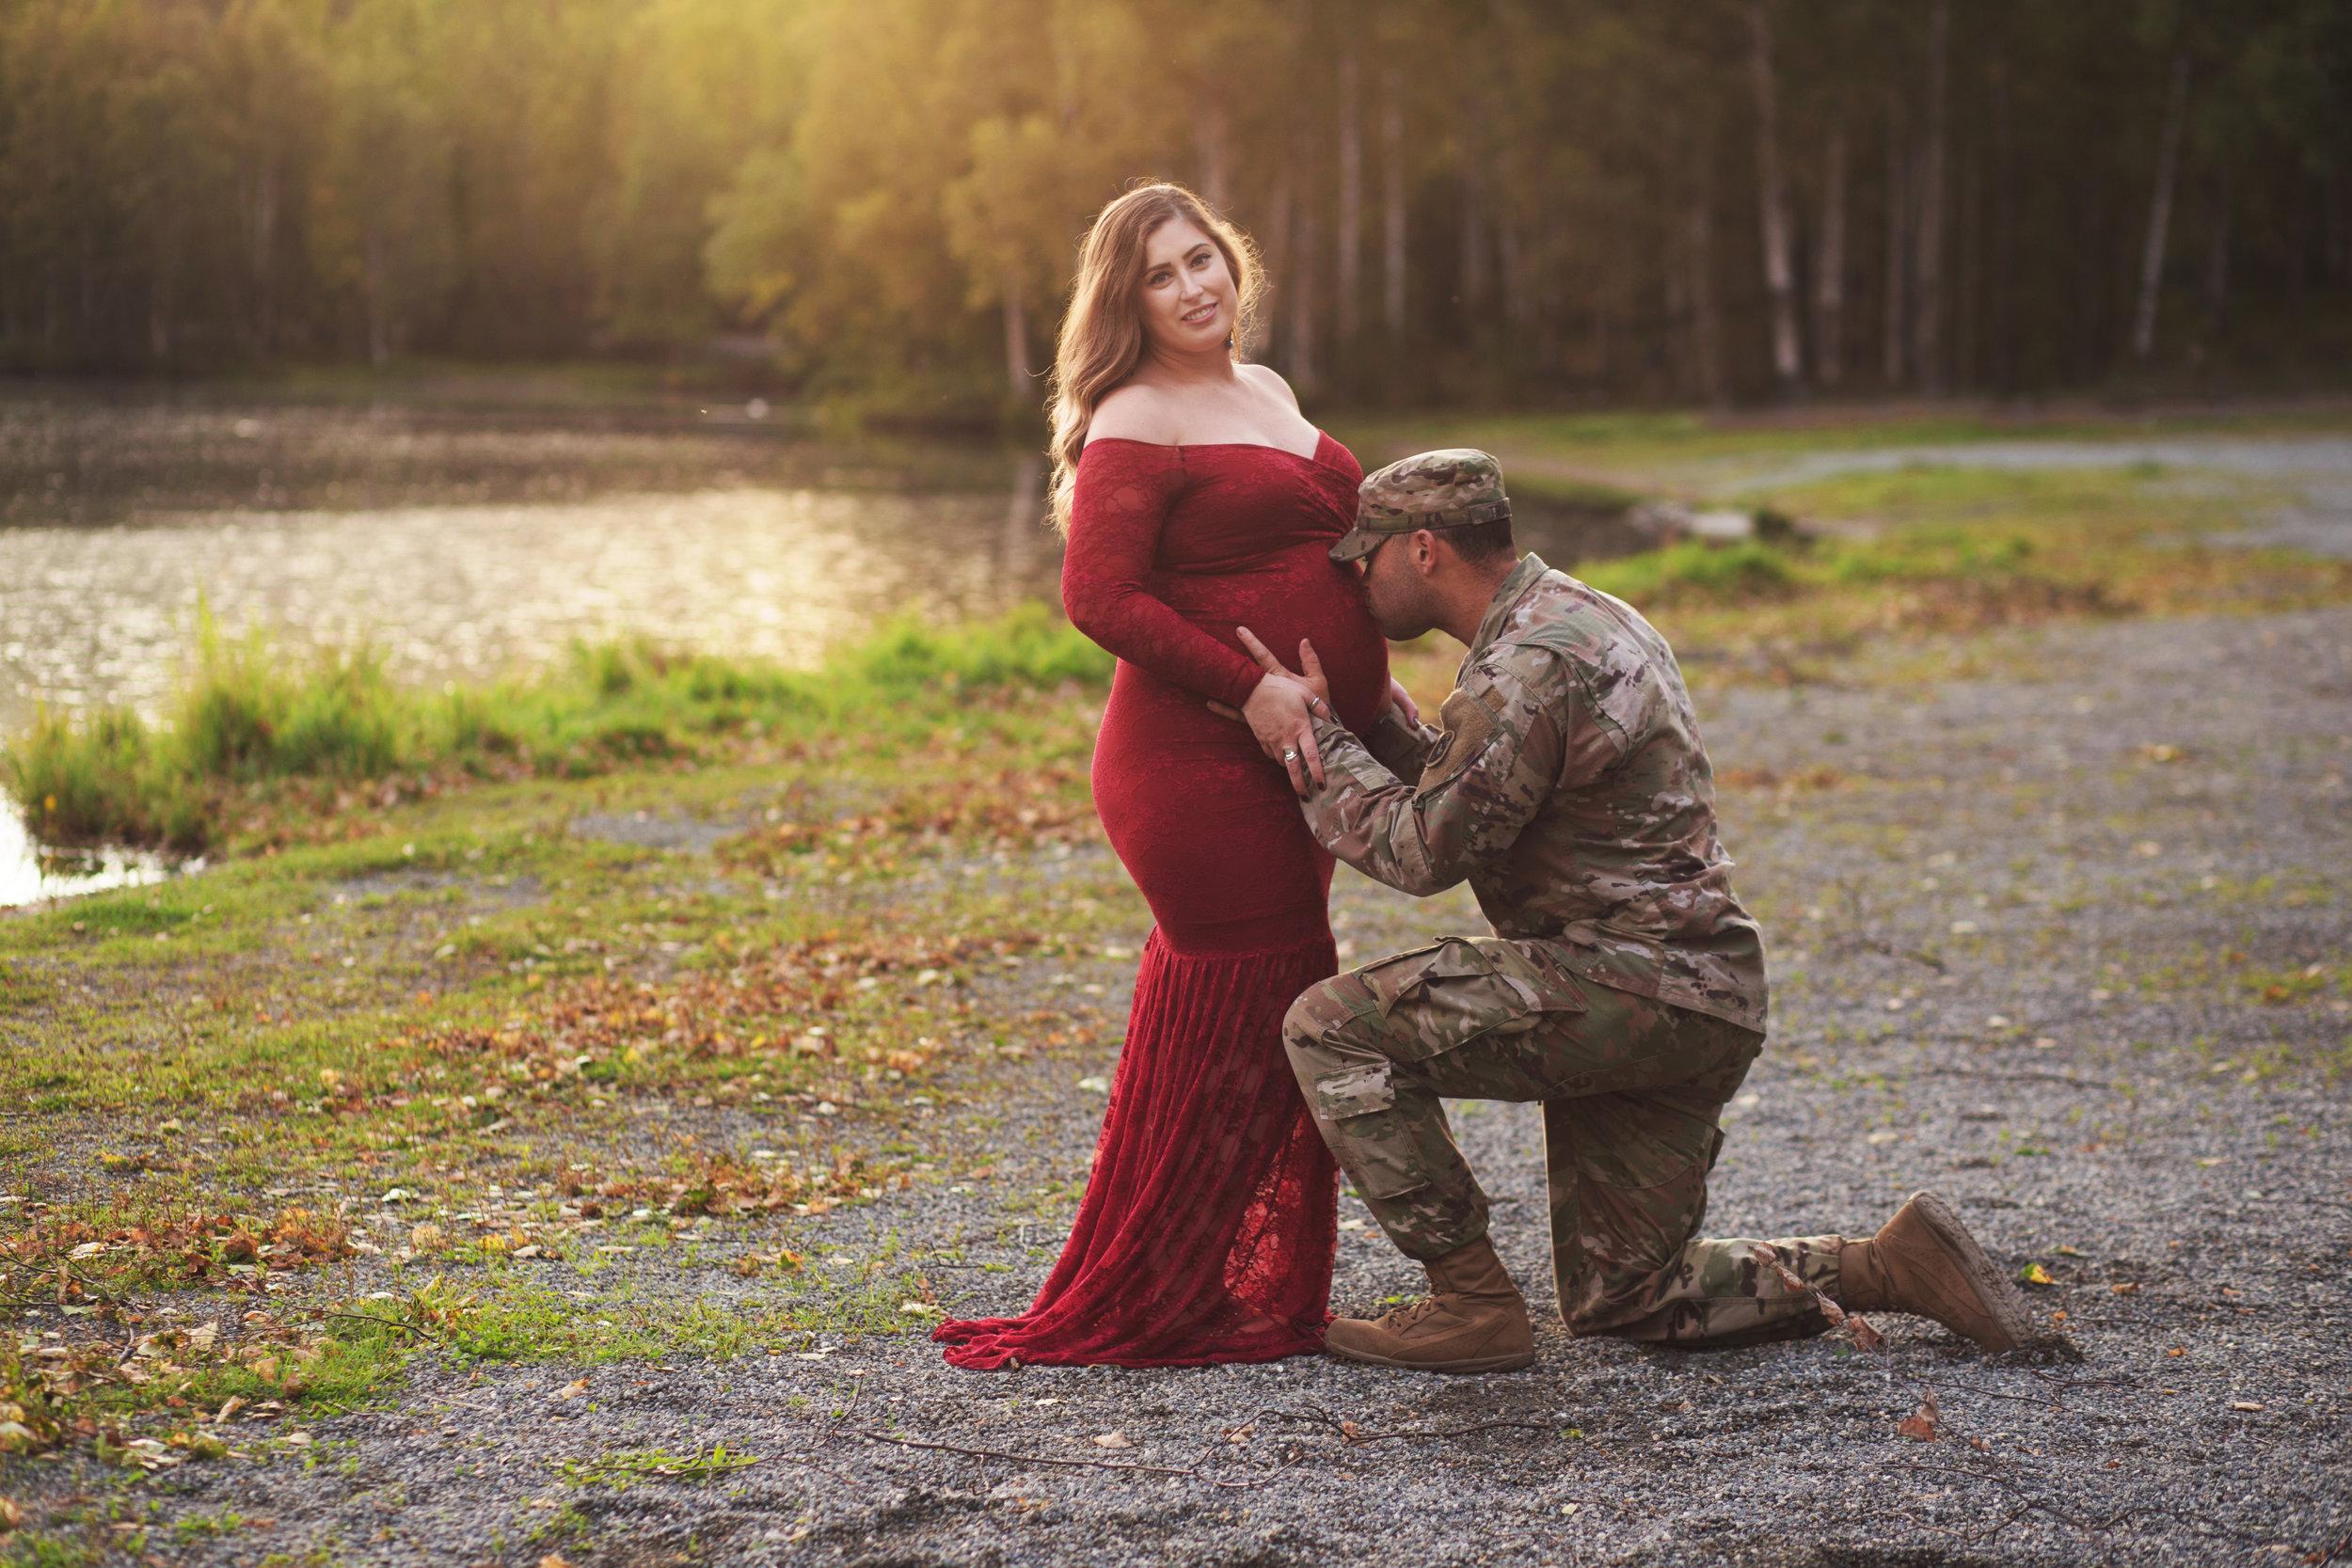 anchorage-maternity-photographer-9.jpg